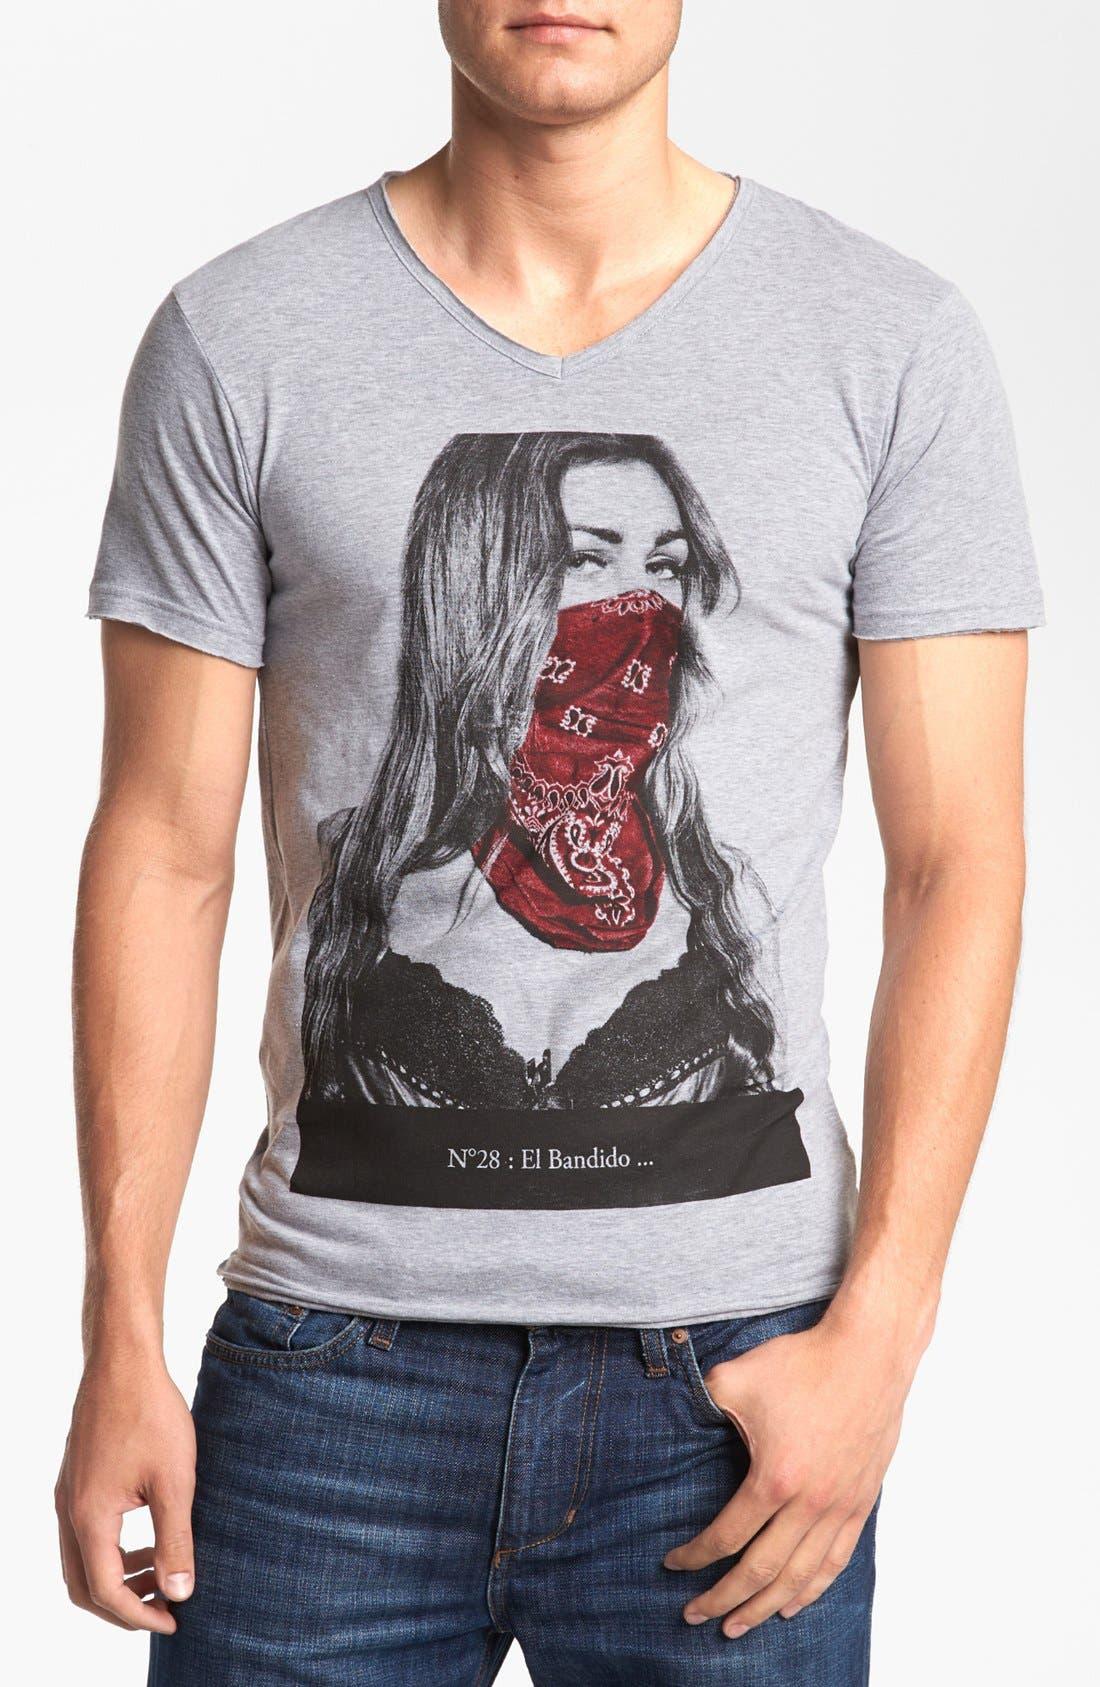 Alternate Image 1 Selected - ELEVENPARIS 'El Bandito' V-Neck T-Shirt